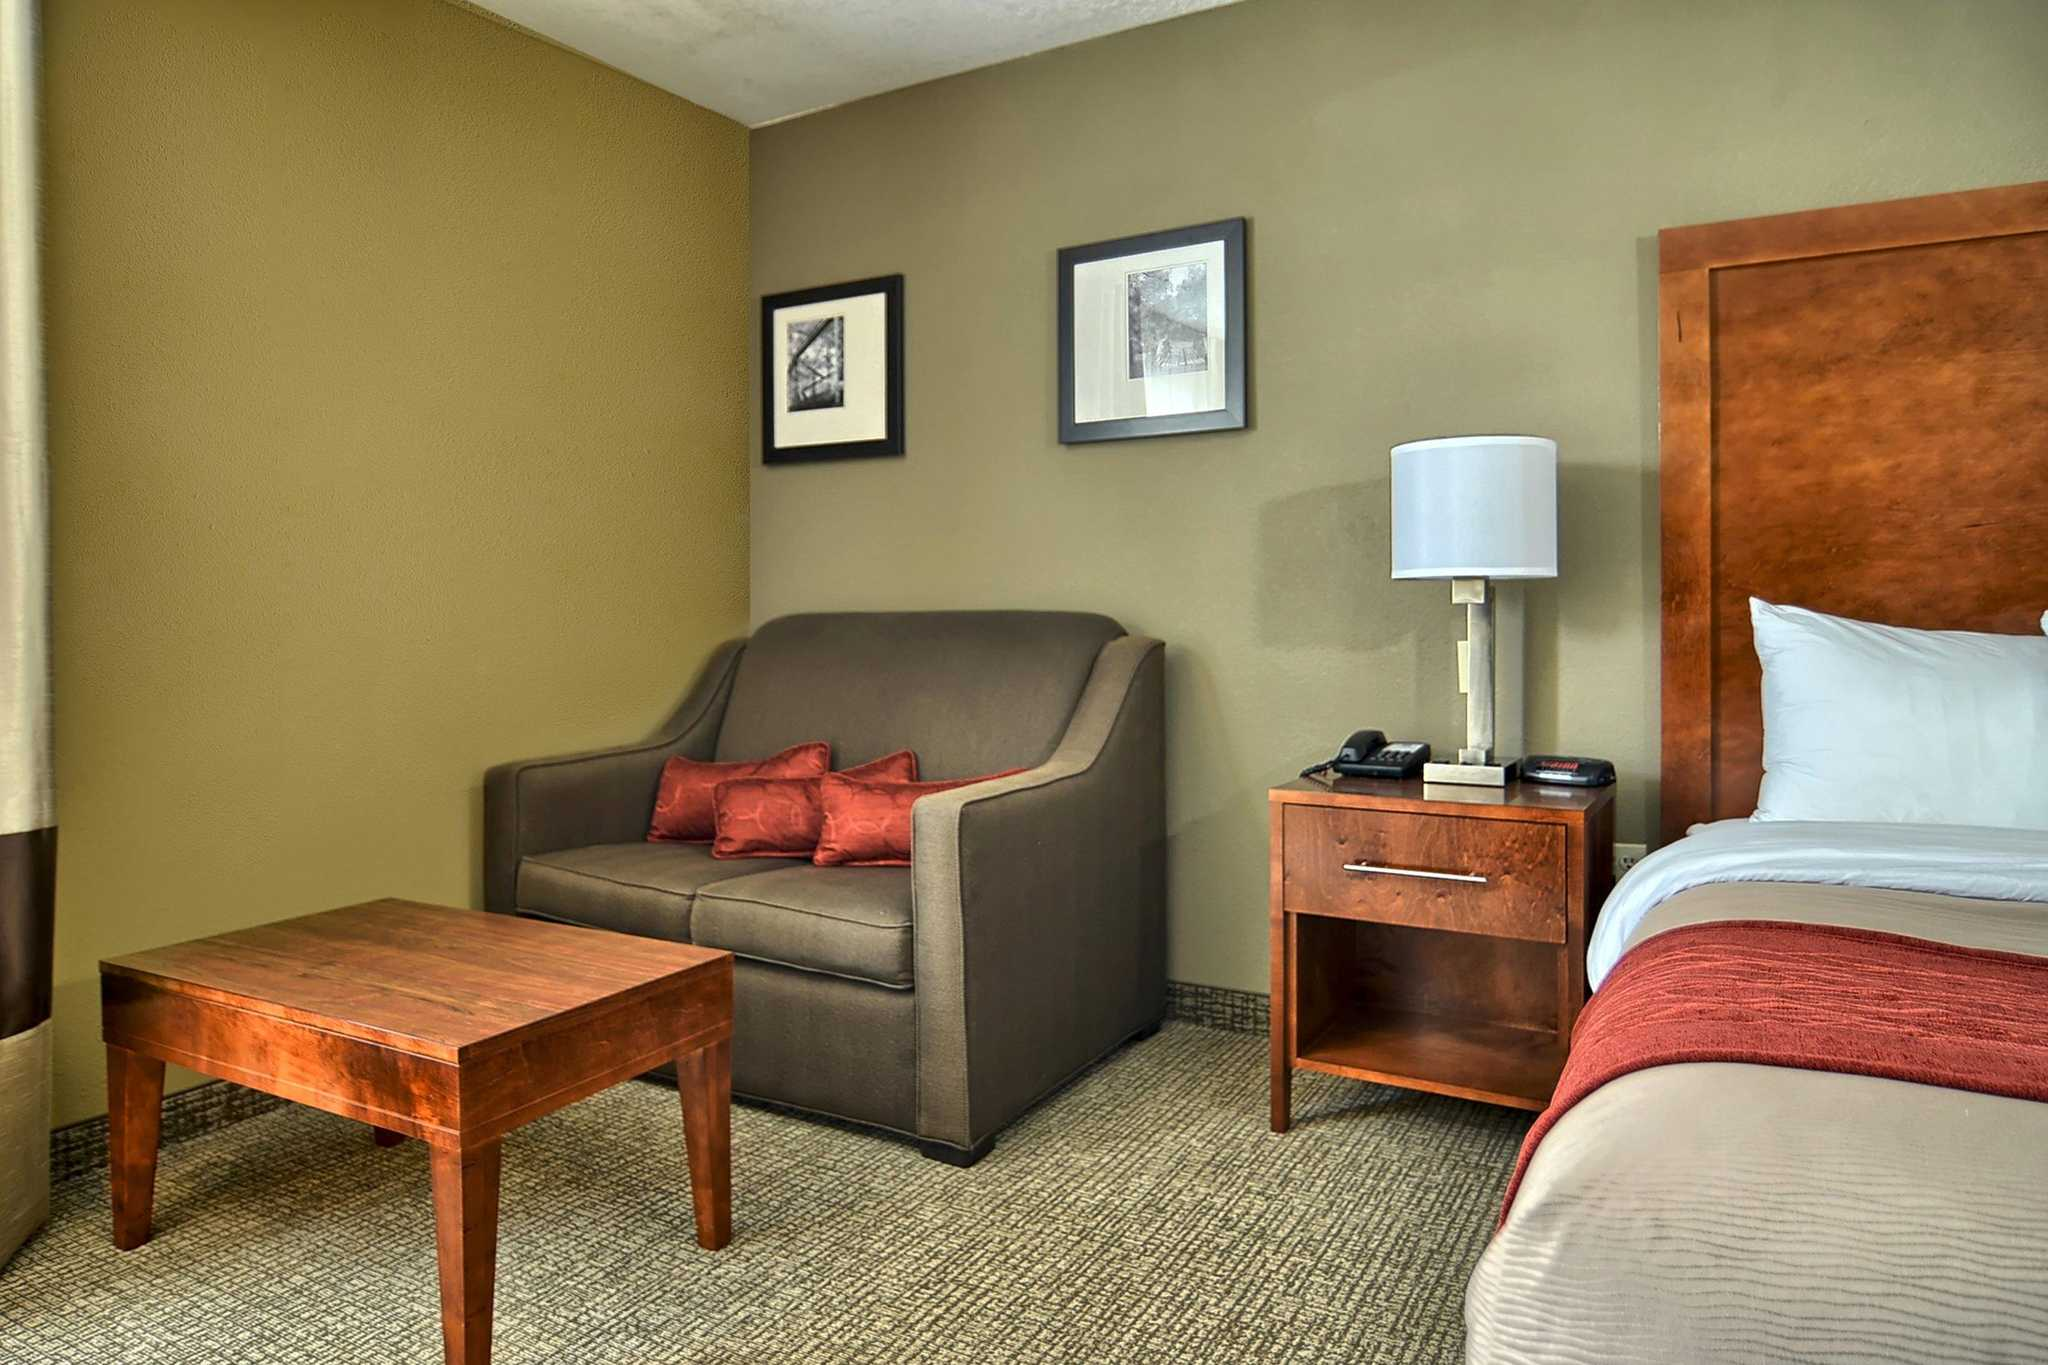 Rent A Room Executive Inn